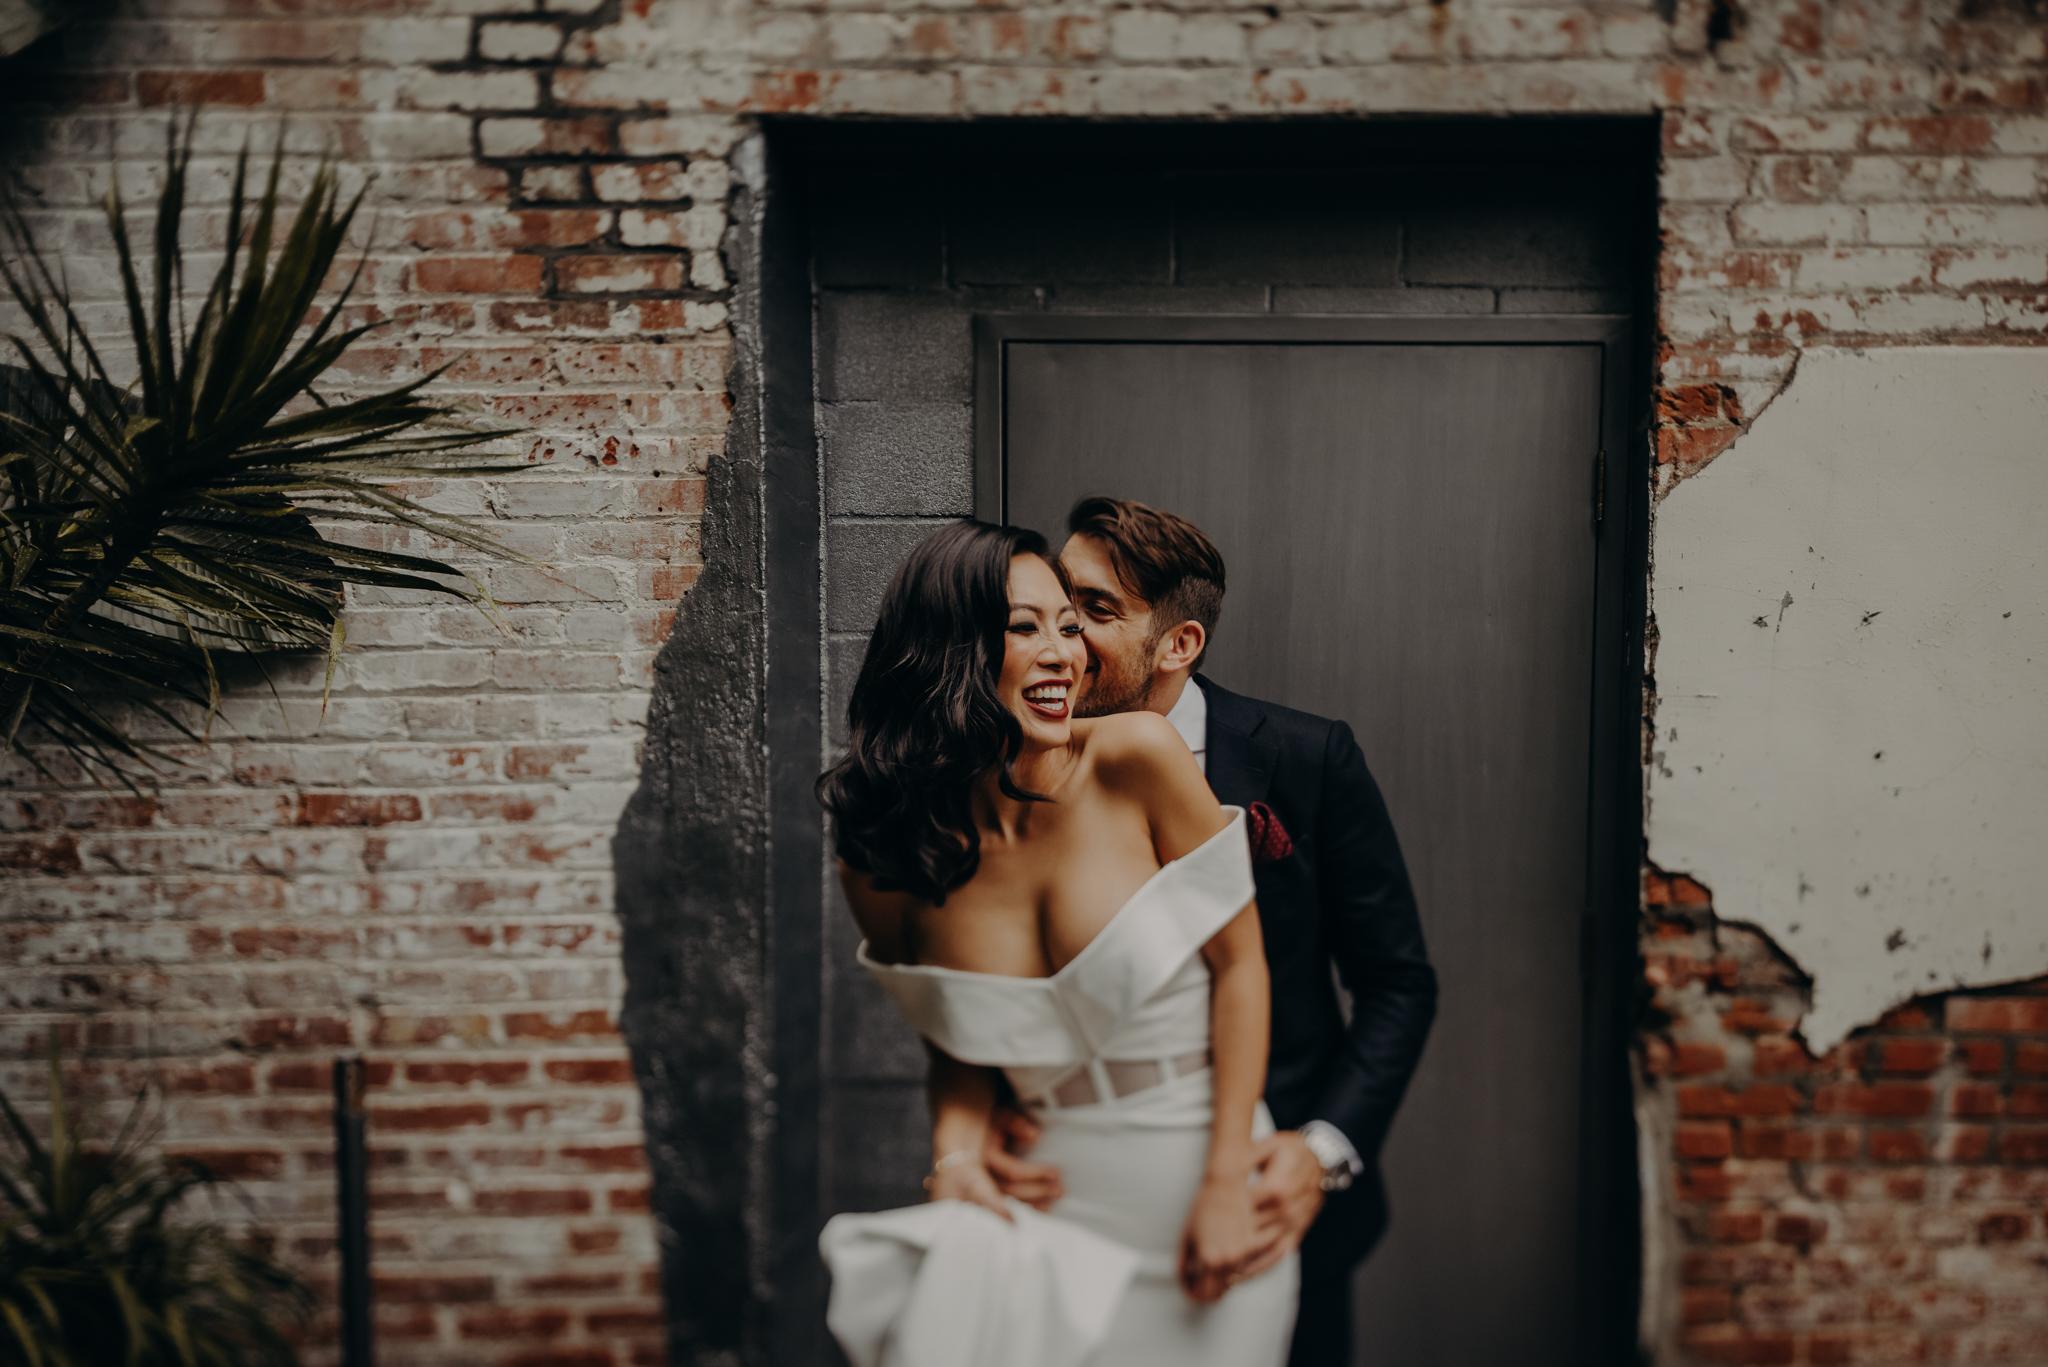 Wedding Photo LA - wedding photographer in los angeles - millwick wedding venue -isaiahandtaylor.com-055.jpg